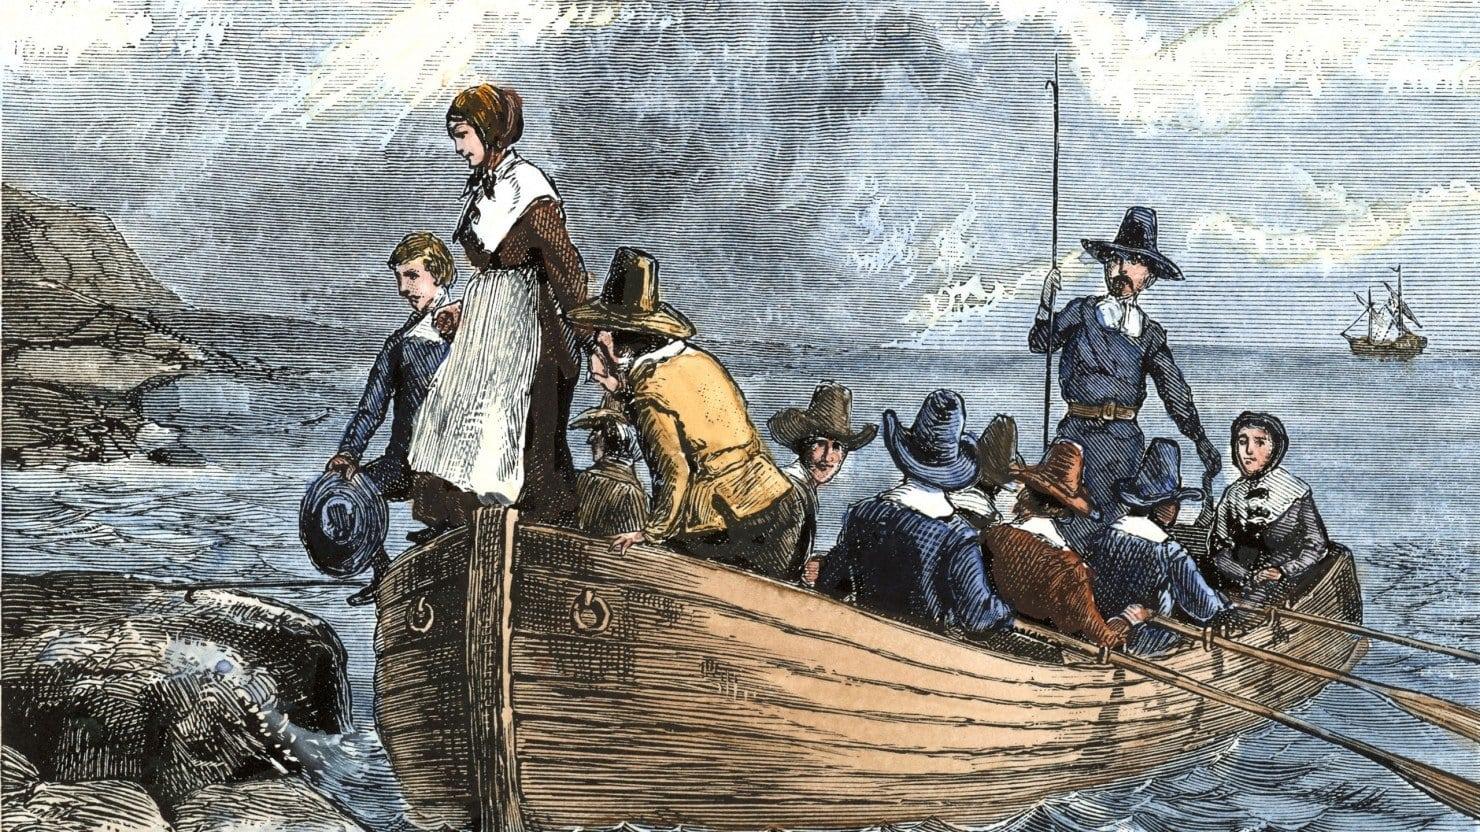 Pilgrims Sailed through Ocean to America